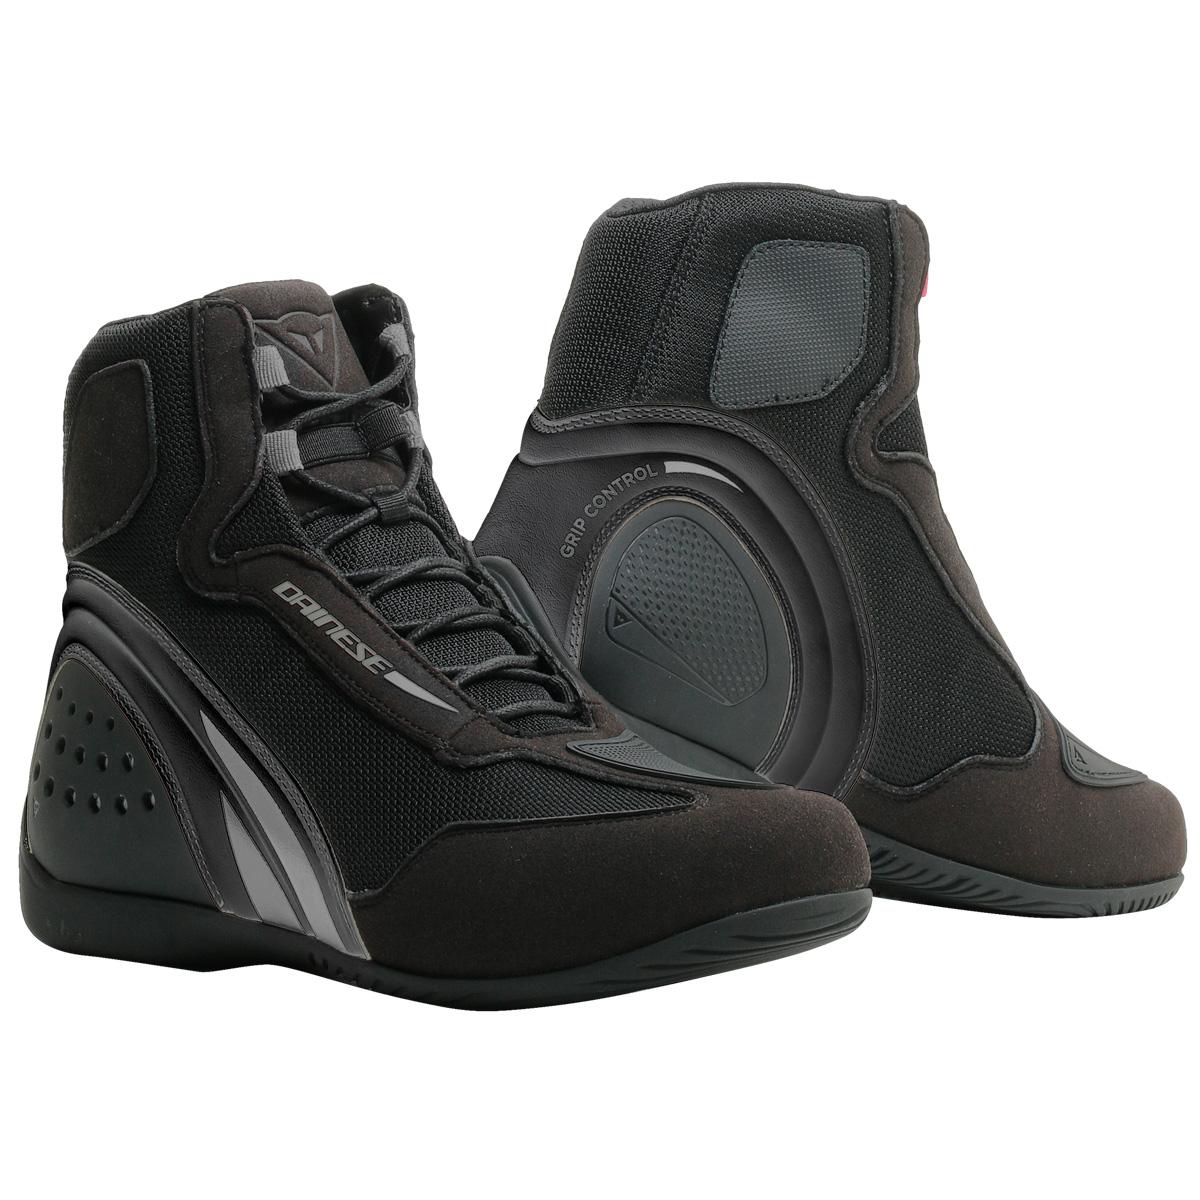 Botas DAINESE Motorshoe D1 Air Lady Black / Black / Anthracite